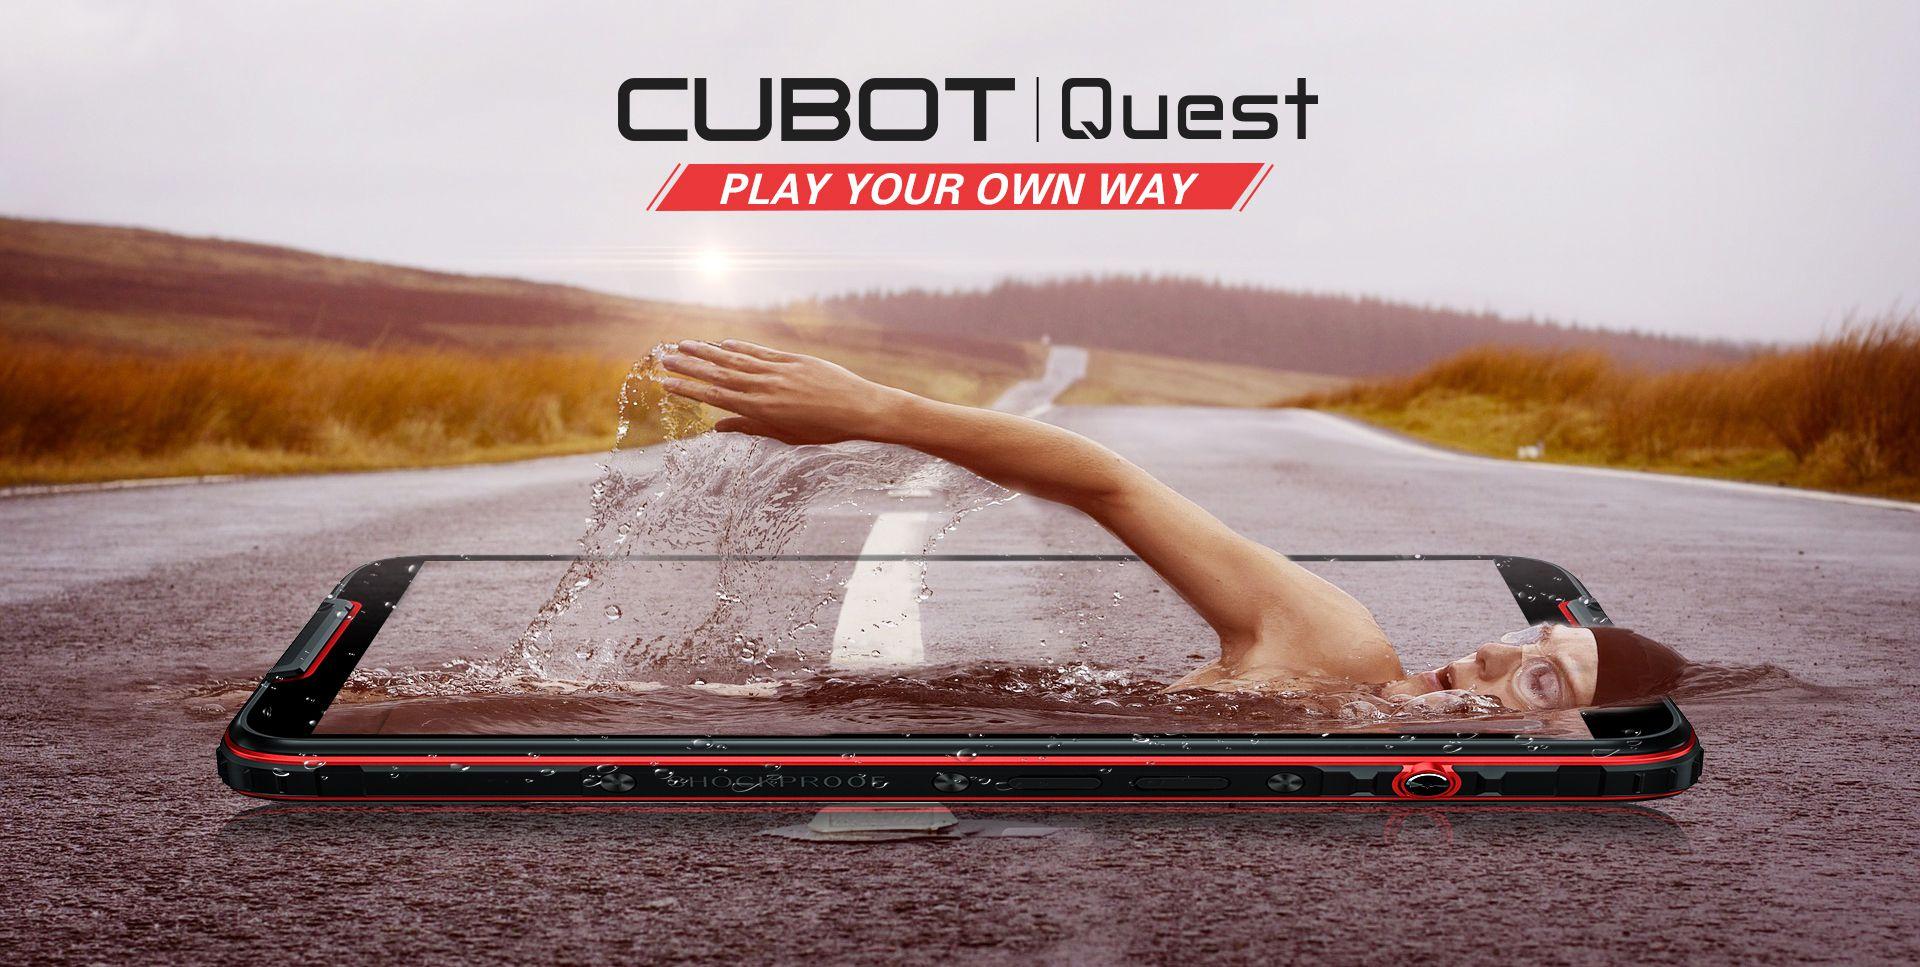 cubot-quest I migliori smartphone Android CUBOT a meno di 200€, qualità e convenienza